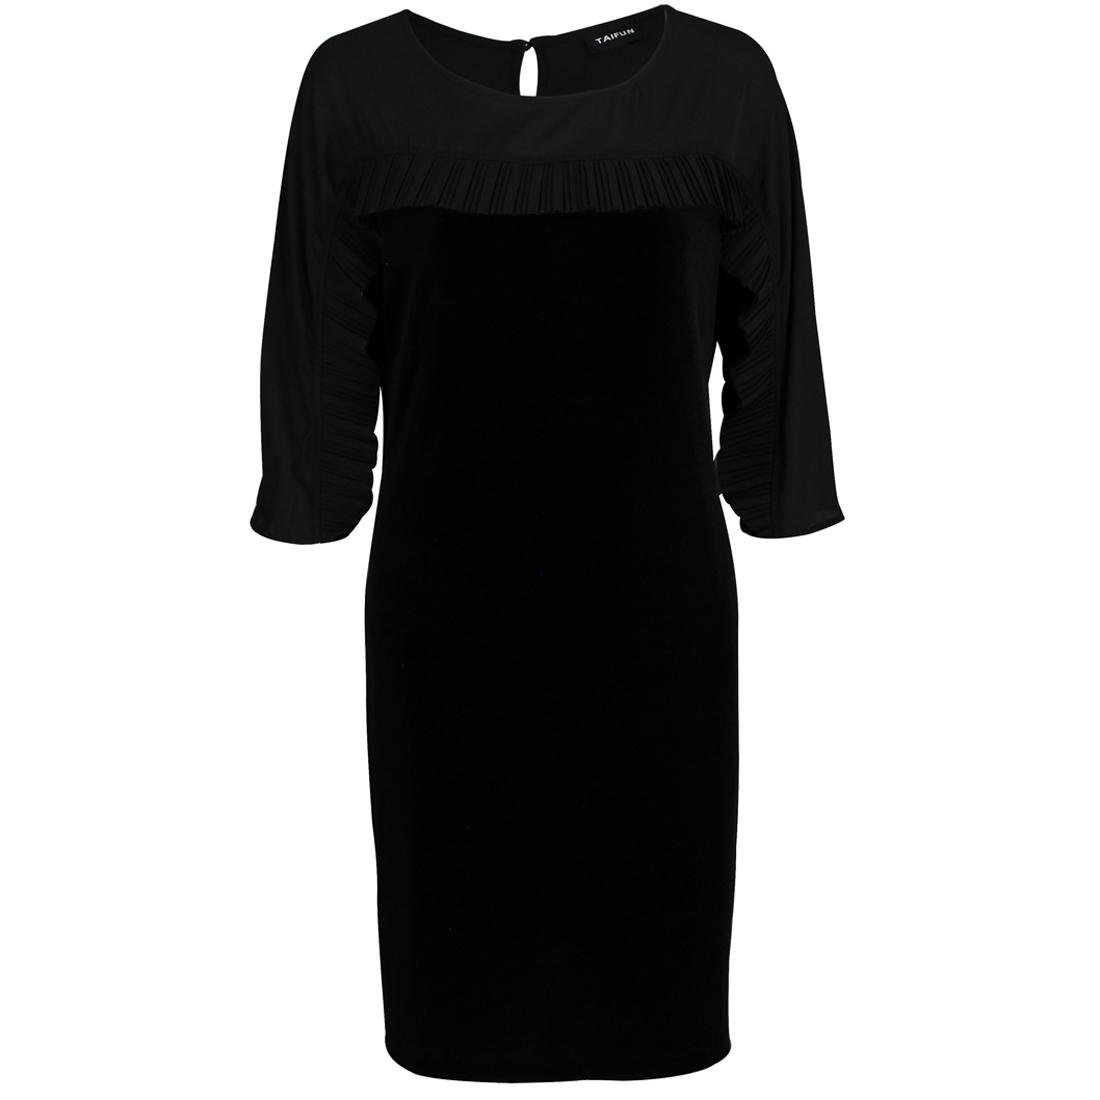 Smit Mode: Taifun jurk 881023 16850 in het Zwart